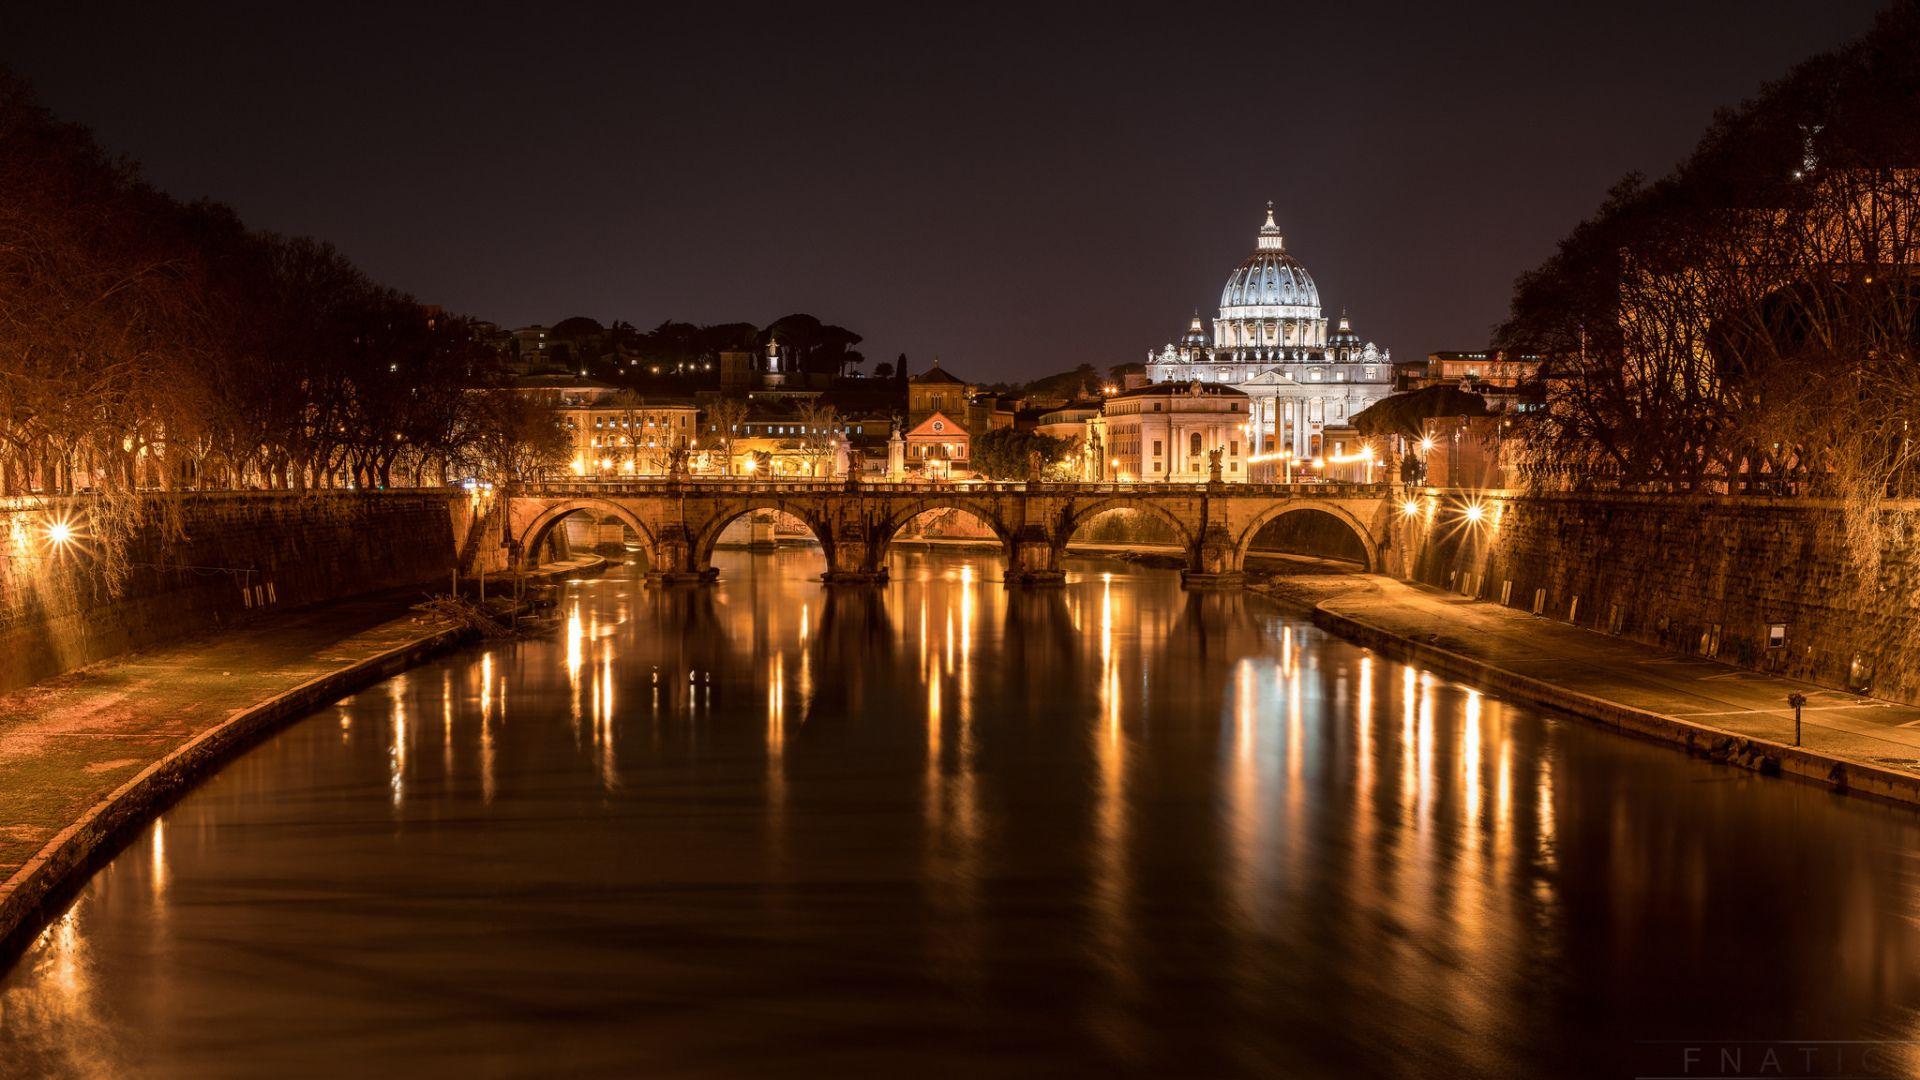 Rome wallpaper background